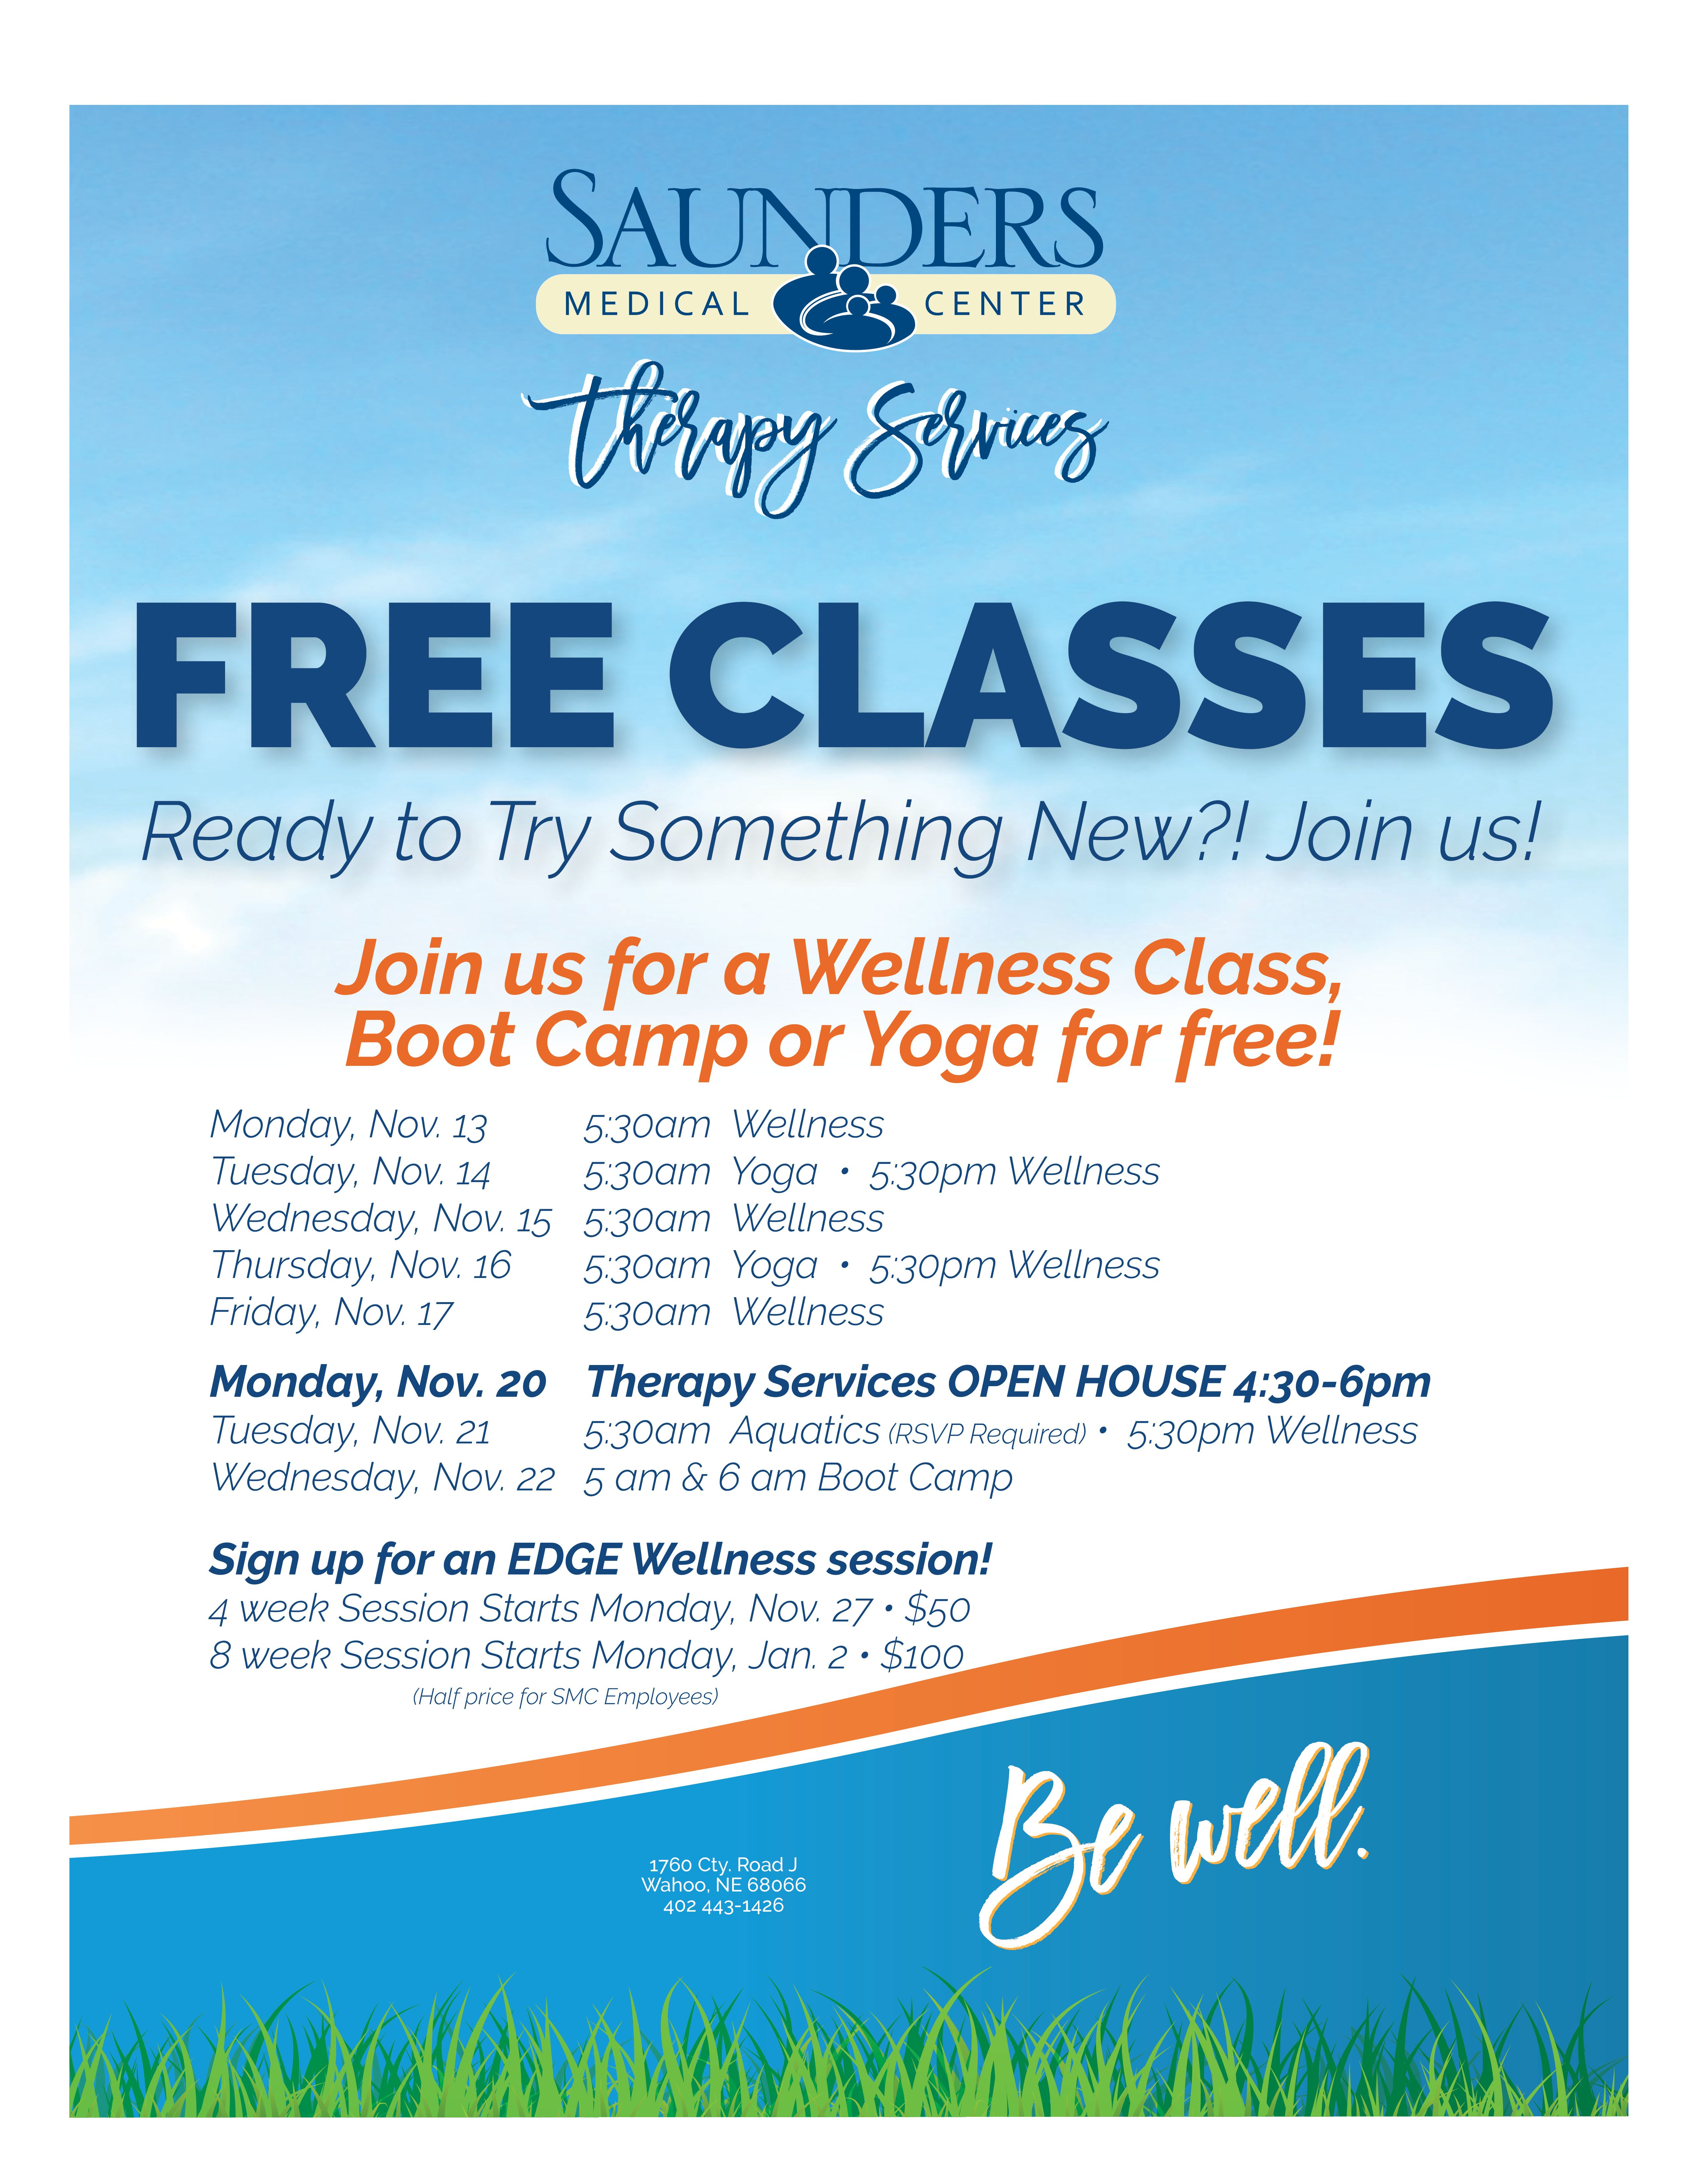 Free Wellness Classes Scheduled